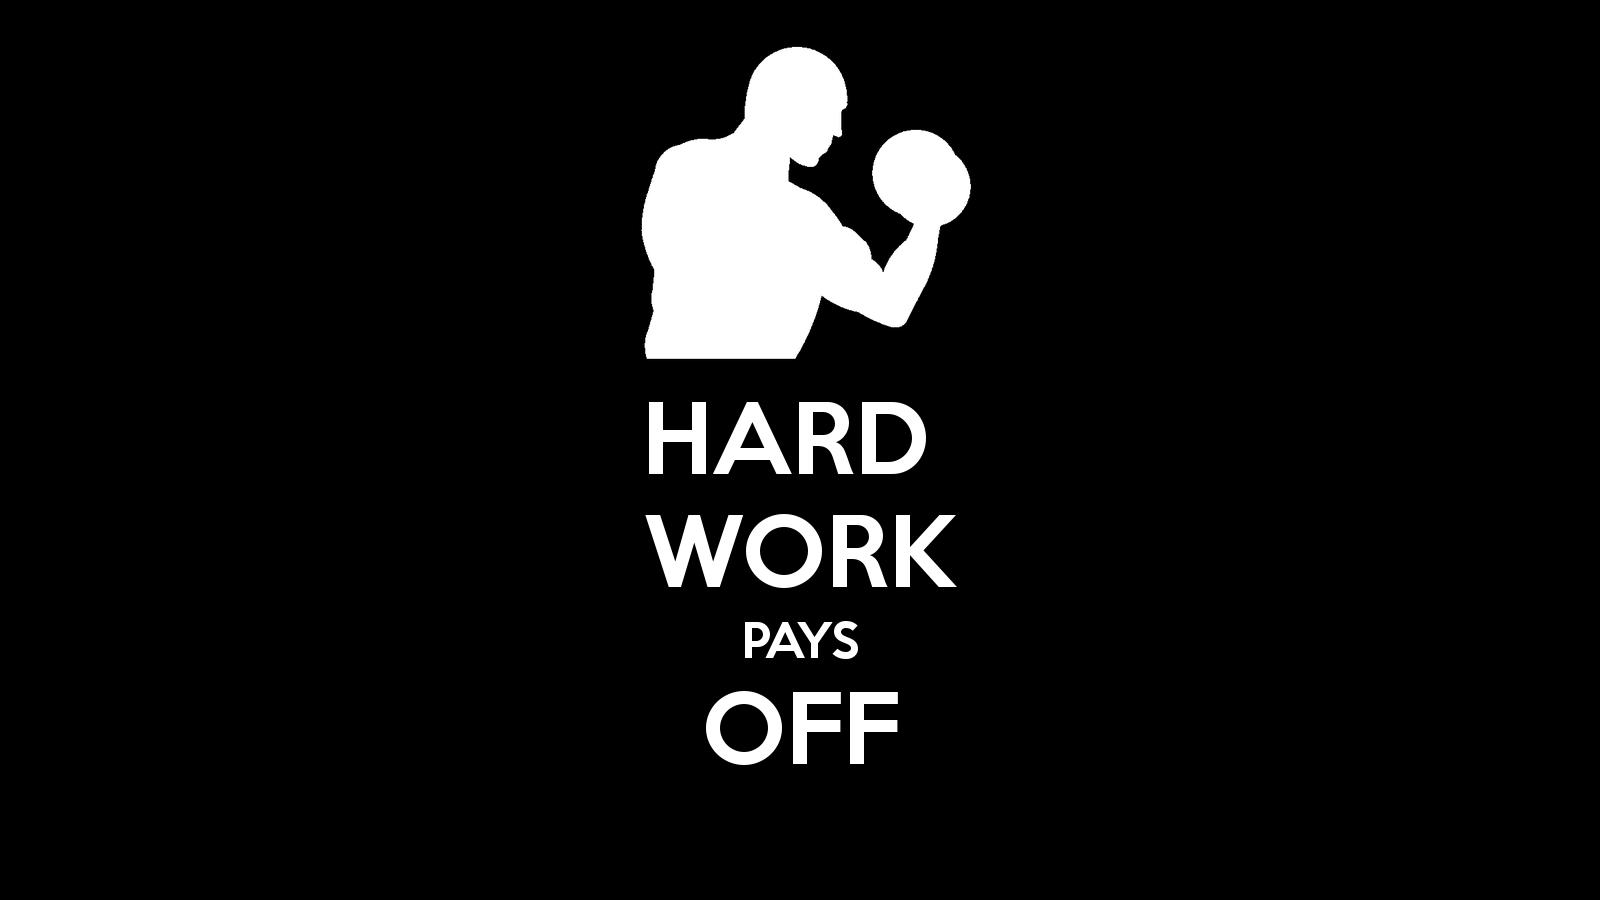 hard-work-pays-off--7